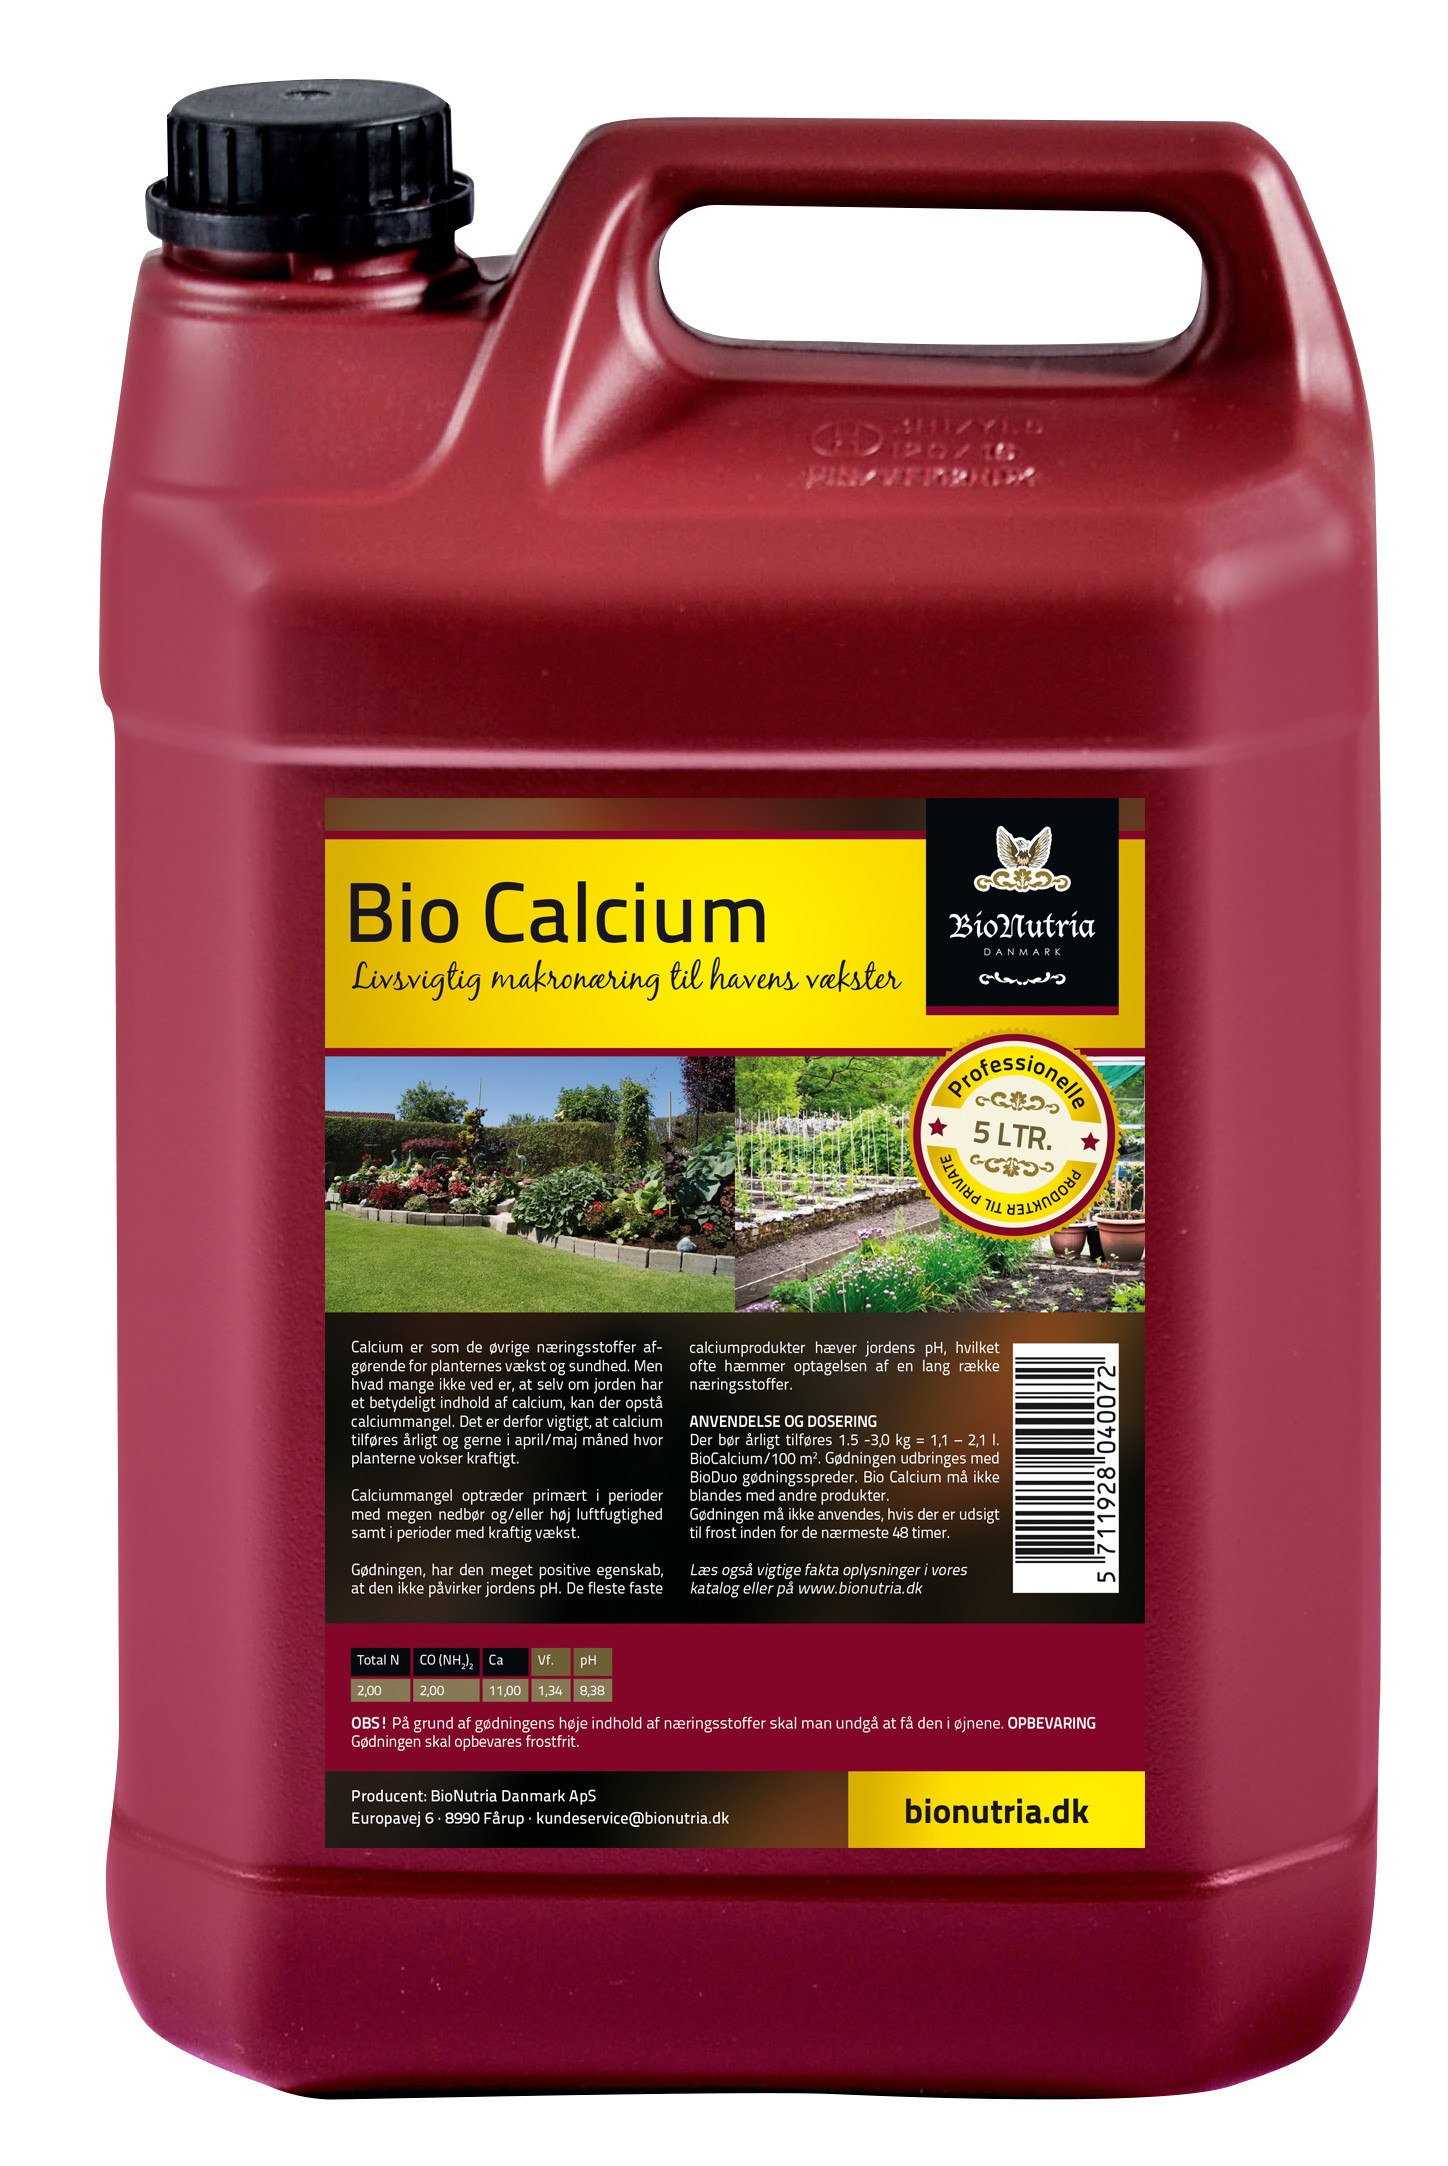 BioNutria BioCalcium - 5 Liter flydende kalk